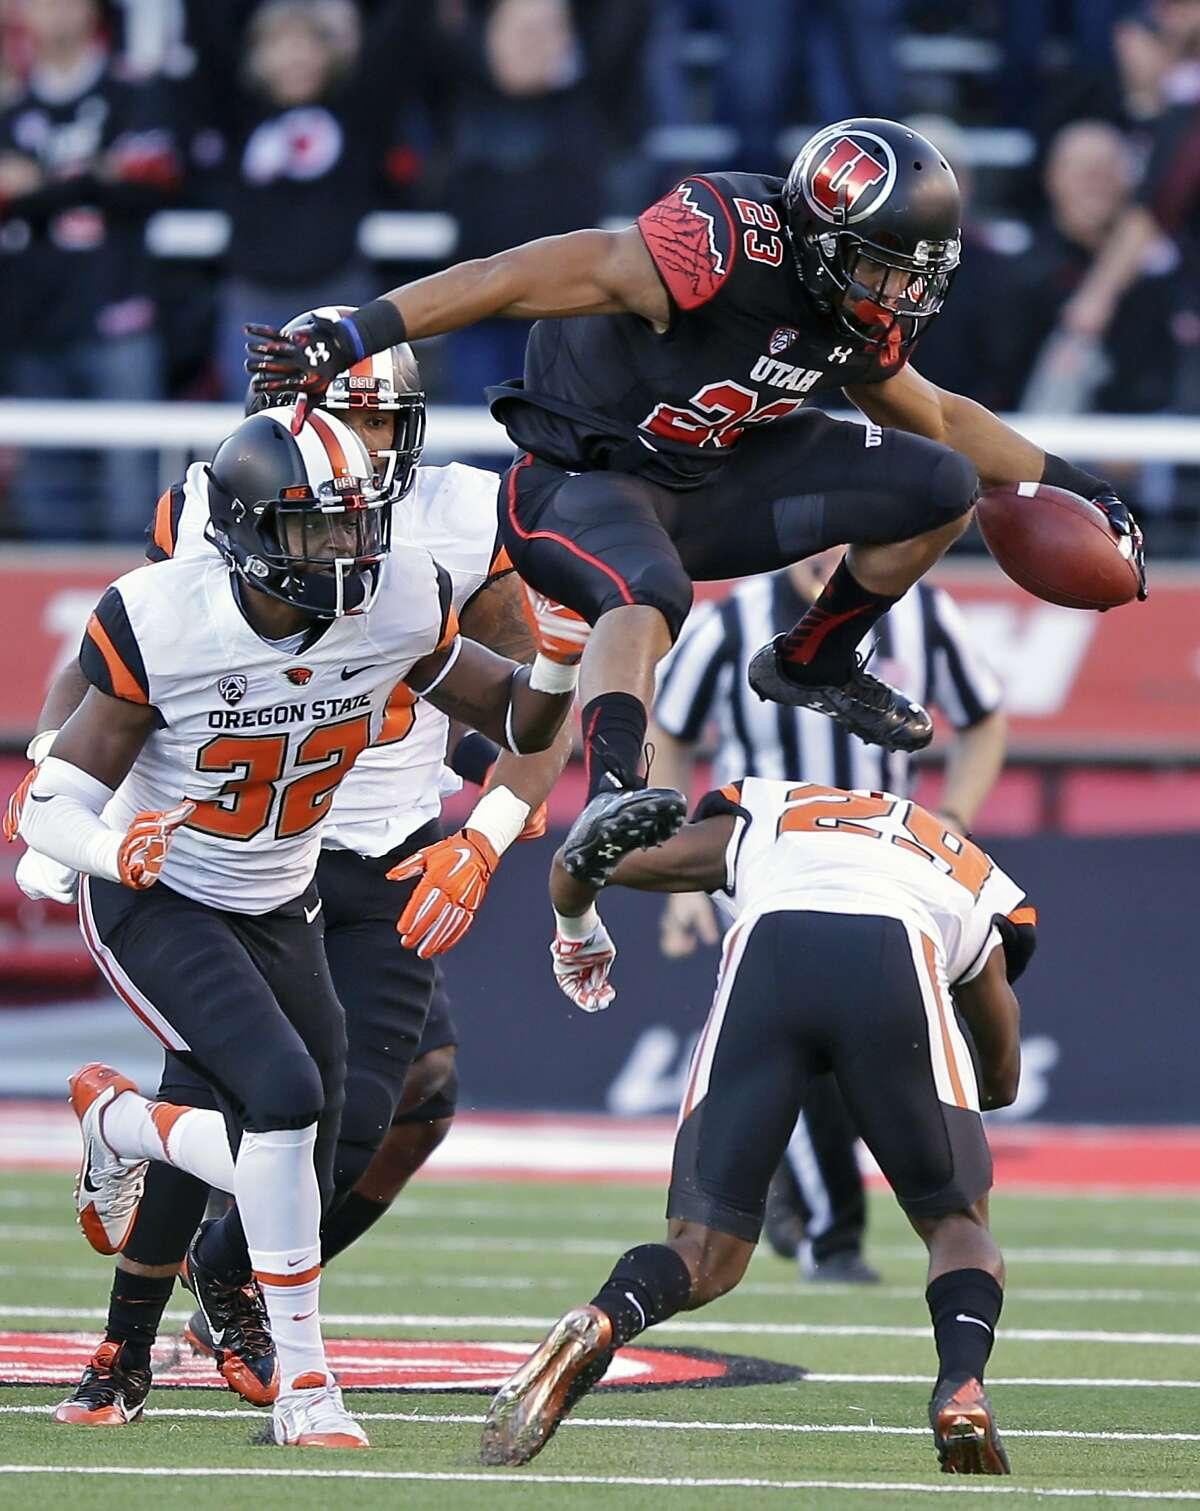 Utah running back Devontae Booker (23) leaps over Oregon State cornerback Dwayne Williams (29) as teammate linebacker Jonathan Willis (32) pursues in the first quarter of an NCAA college football game Saturday, Oct. 31, 2015, in Salt Lake City. (AP Photo/Rick Bowmer)